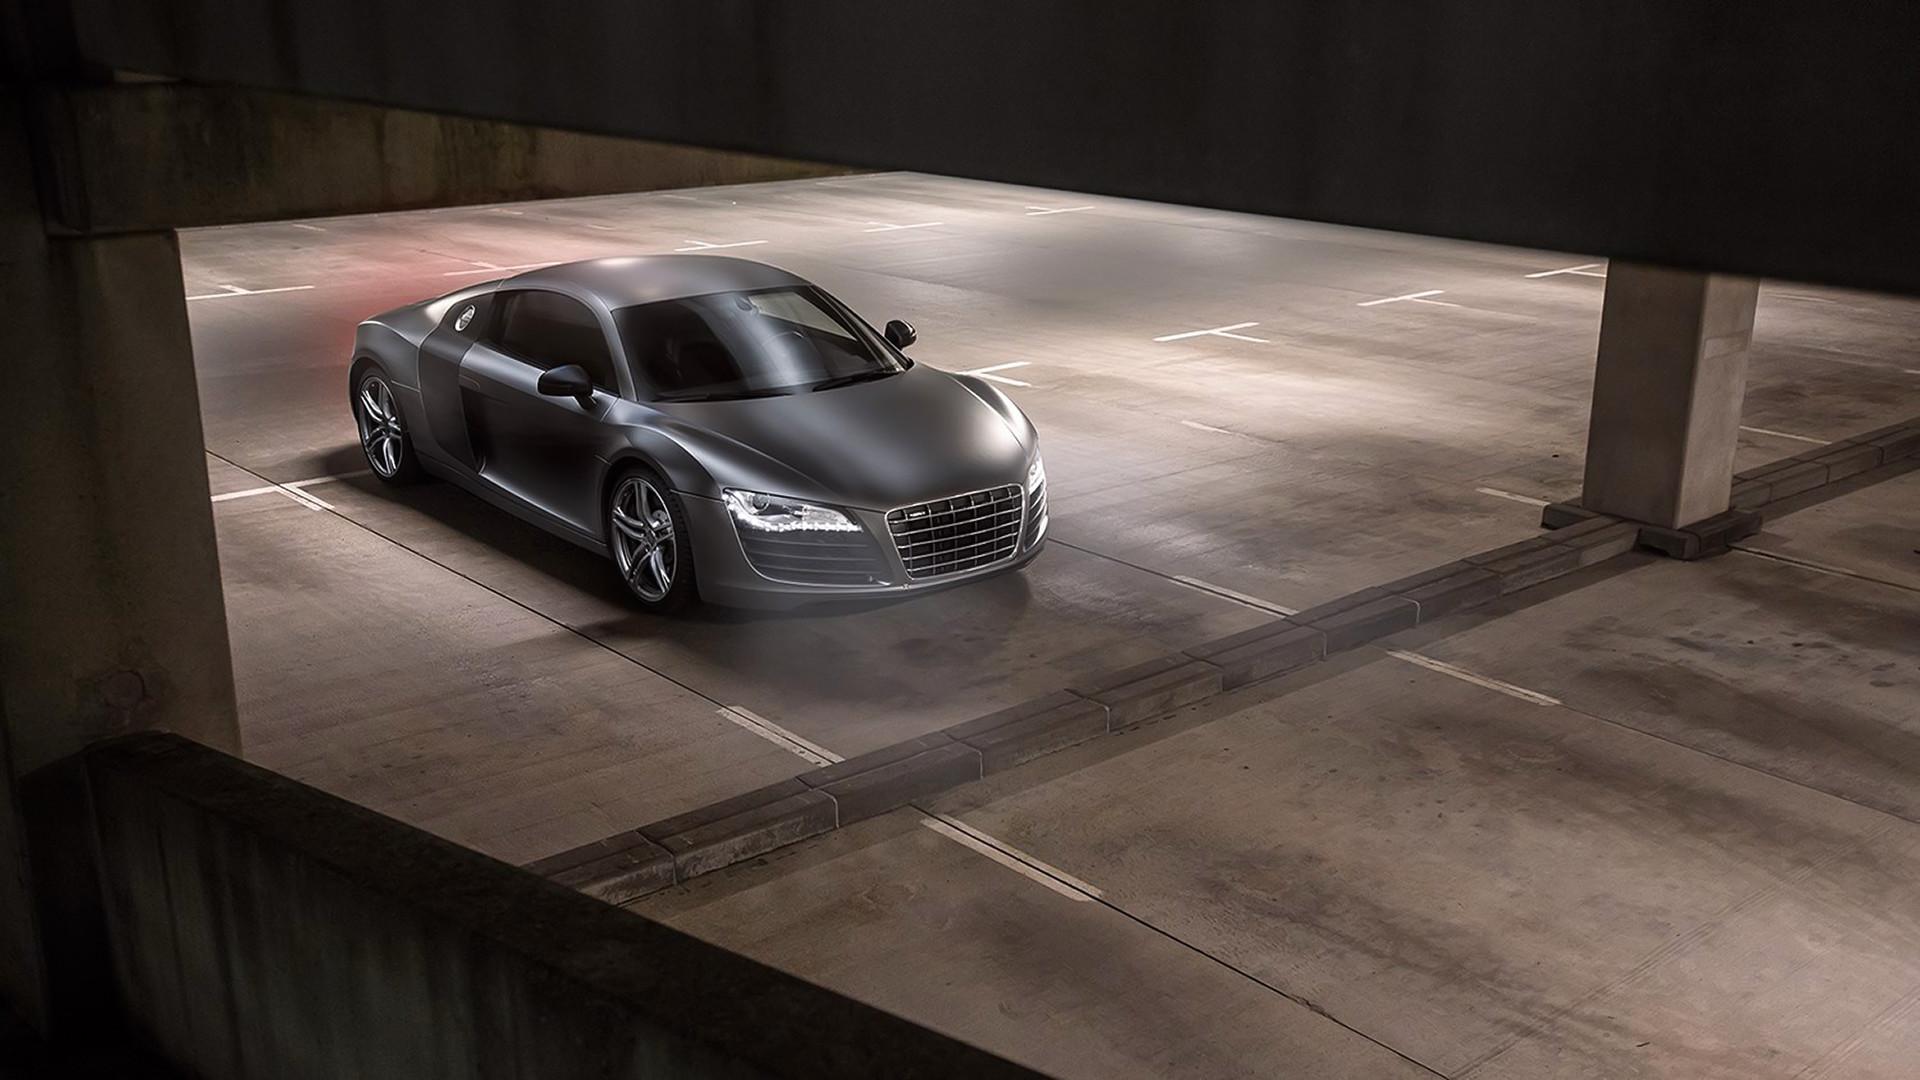 Audi Car Hd Wallpapers 1080p Die 80 Besten Audi R8 Wallpapers